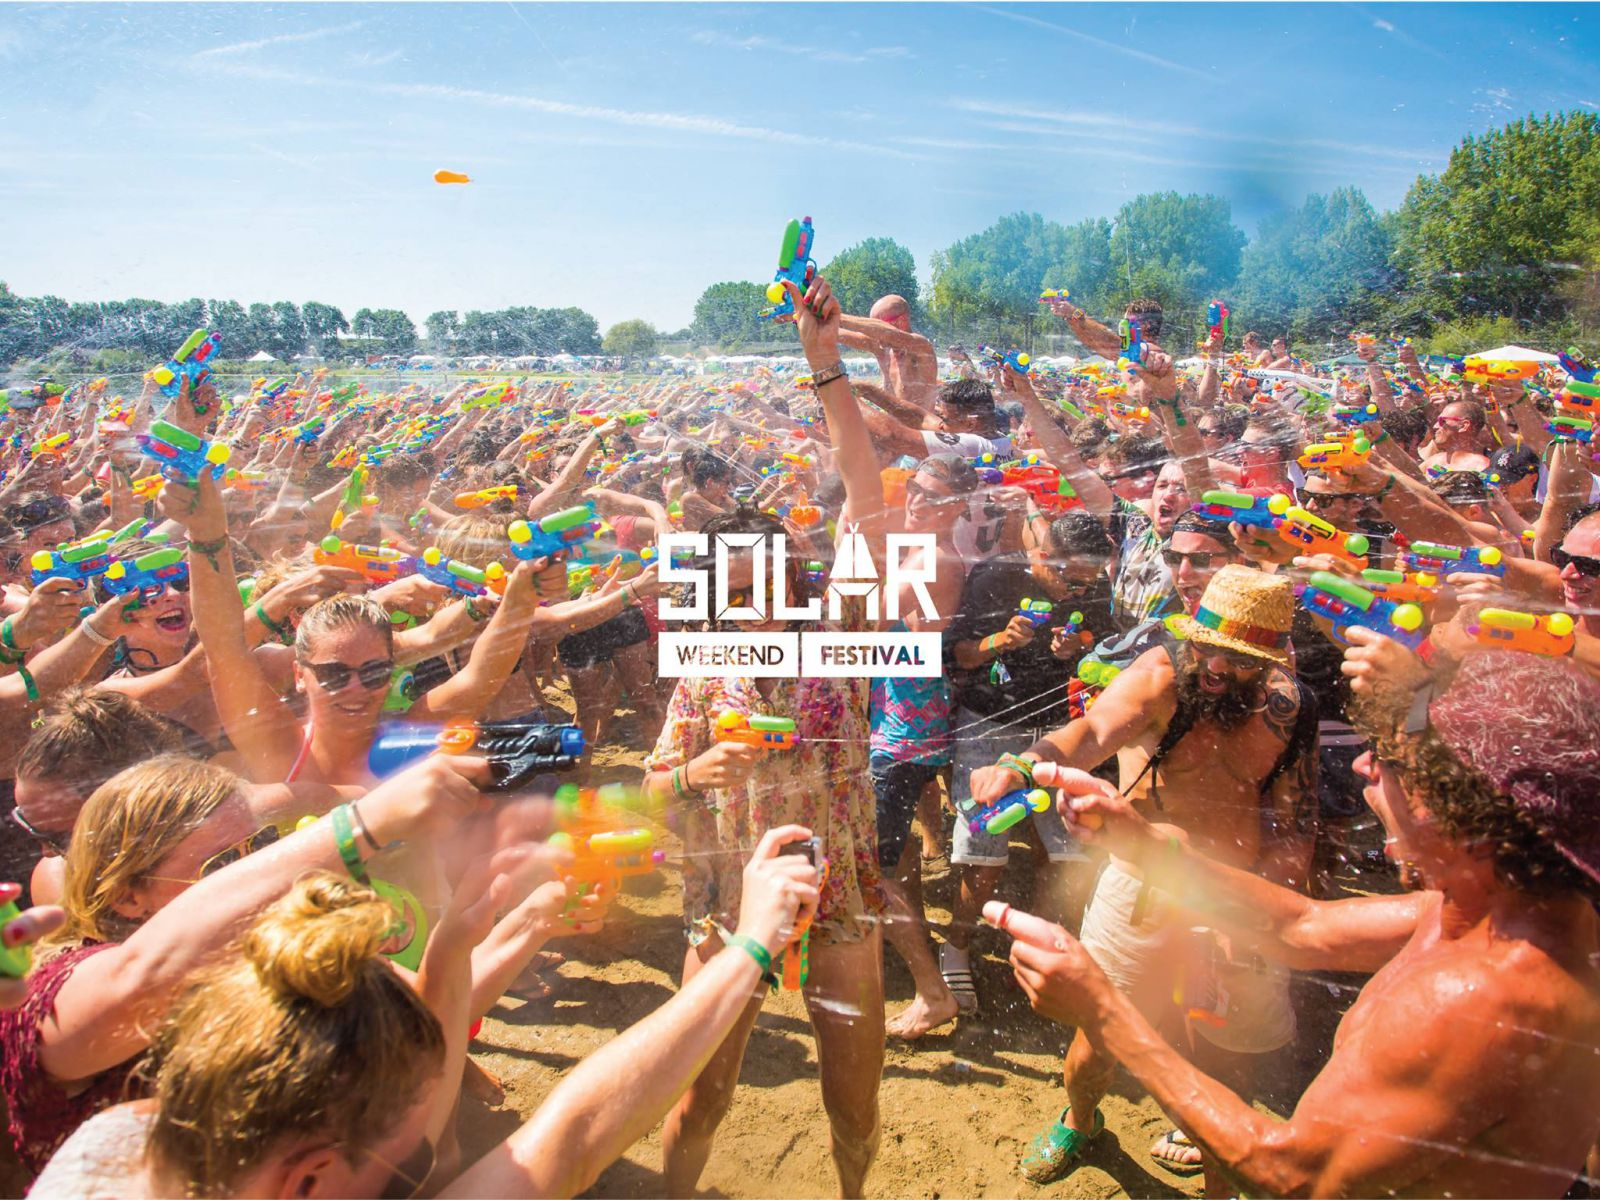 solar-weekend2